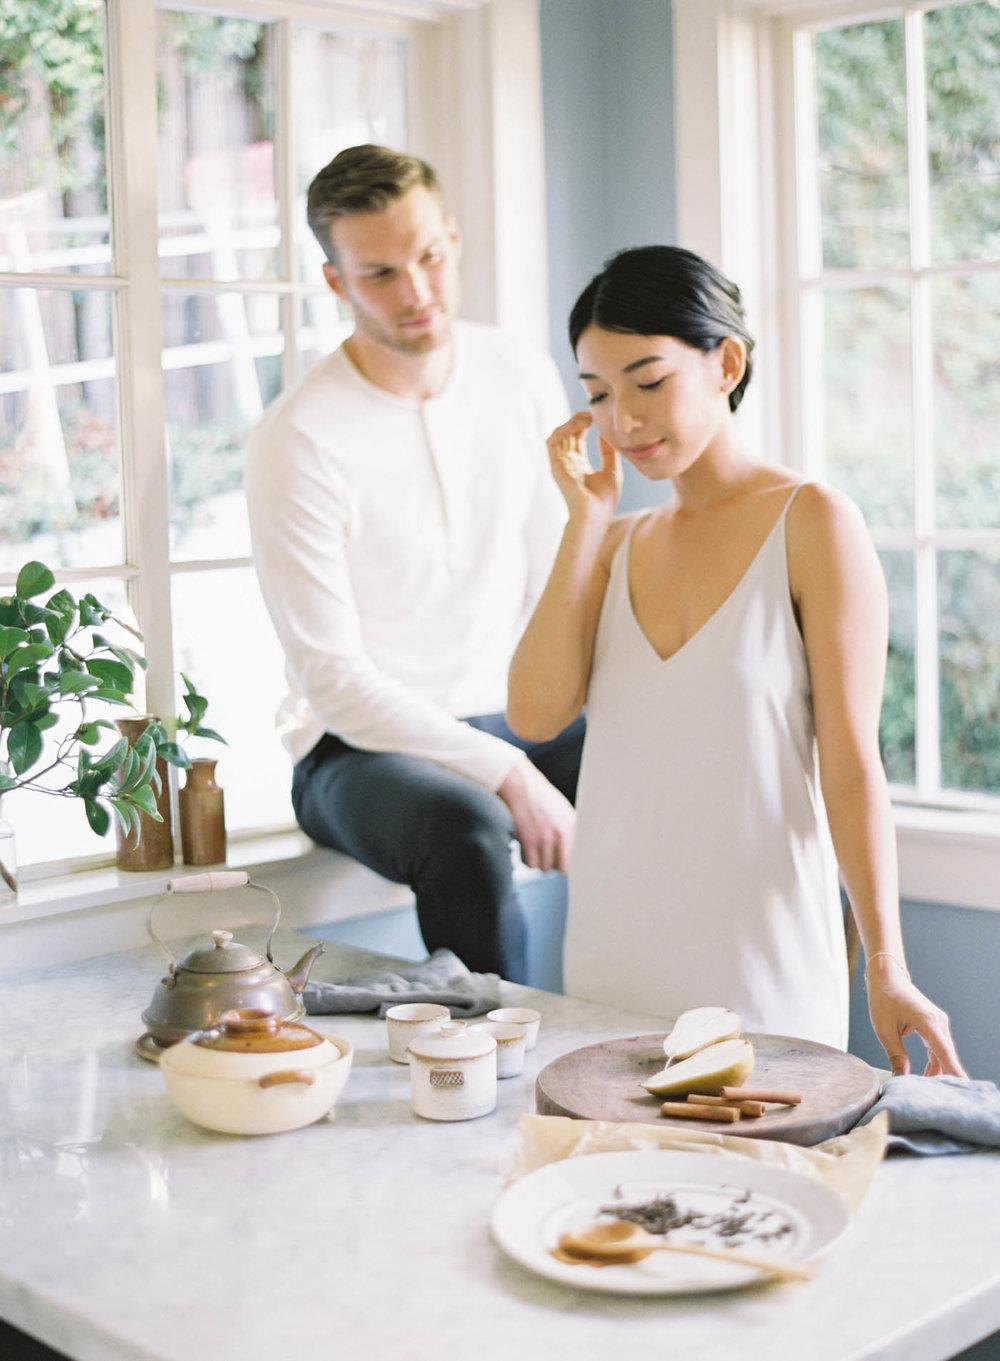 riviera-house-engagement-109-Jen_Huang-Tea-Ceremony-380-Jen_Huang-004149-R1-009.jpg